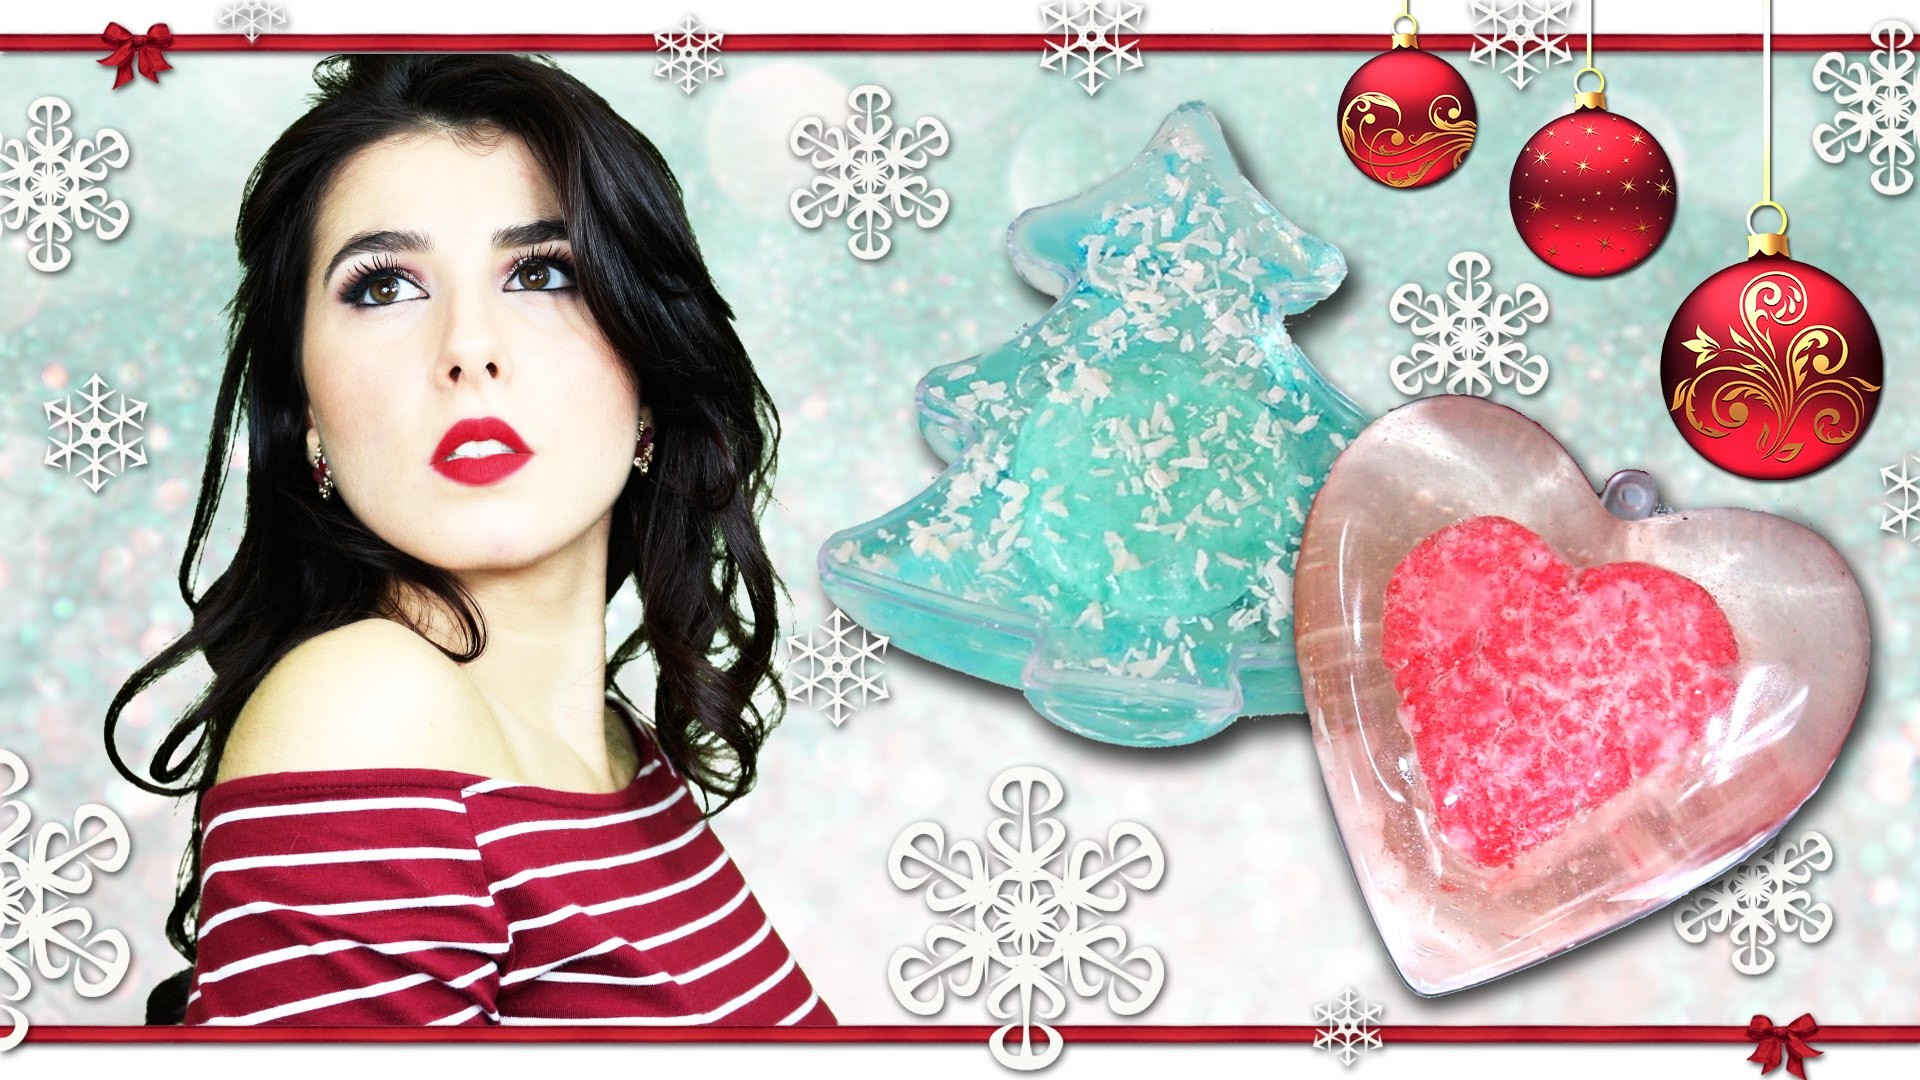 Fizzy Soap Christmas DIY • Saponi effervescenti per Natale • Last minute gifts idea • Marisa'Style